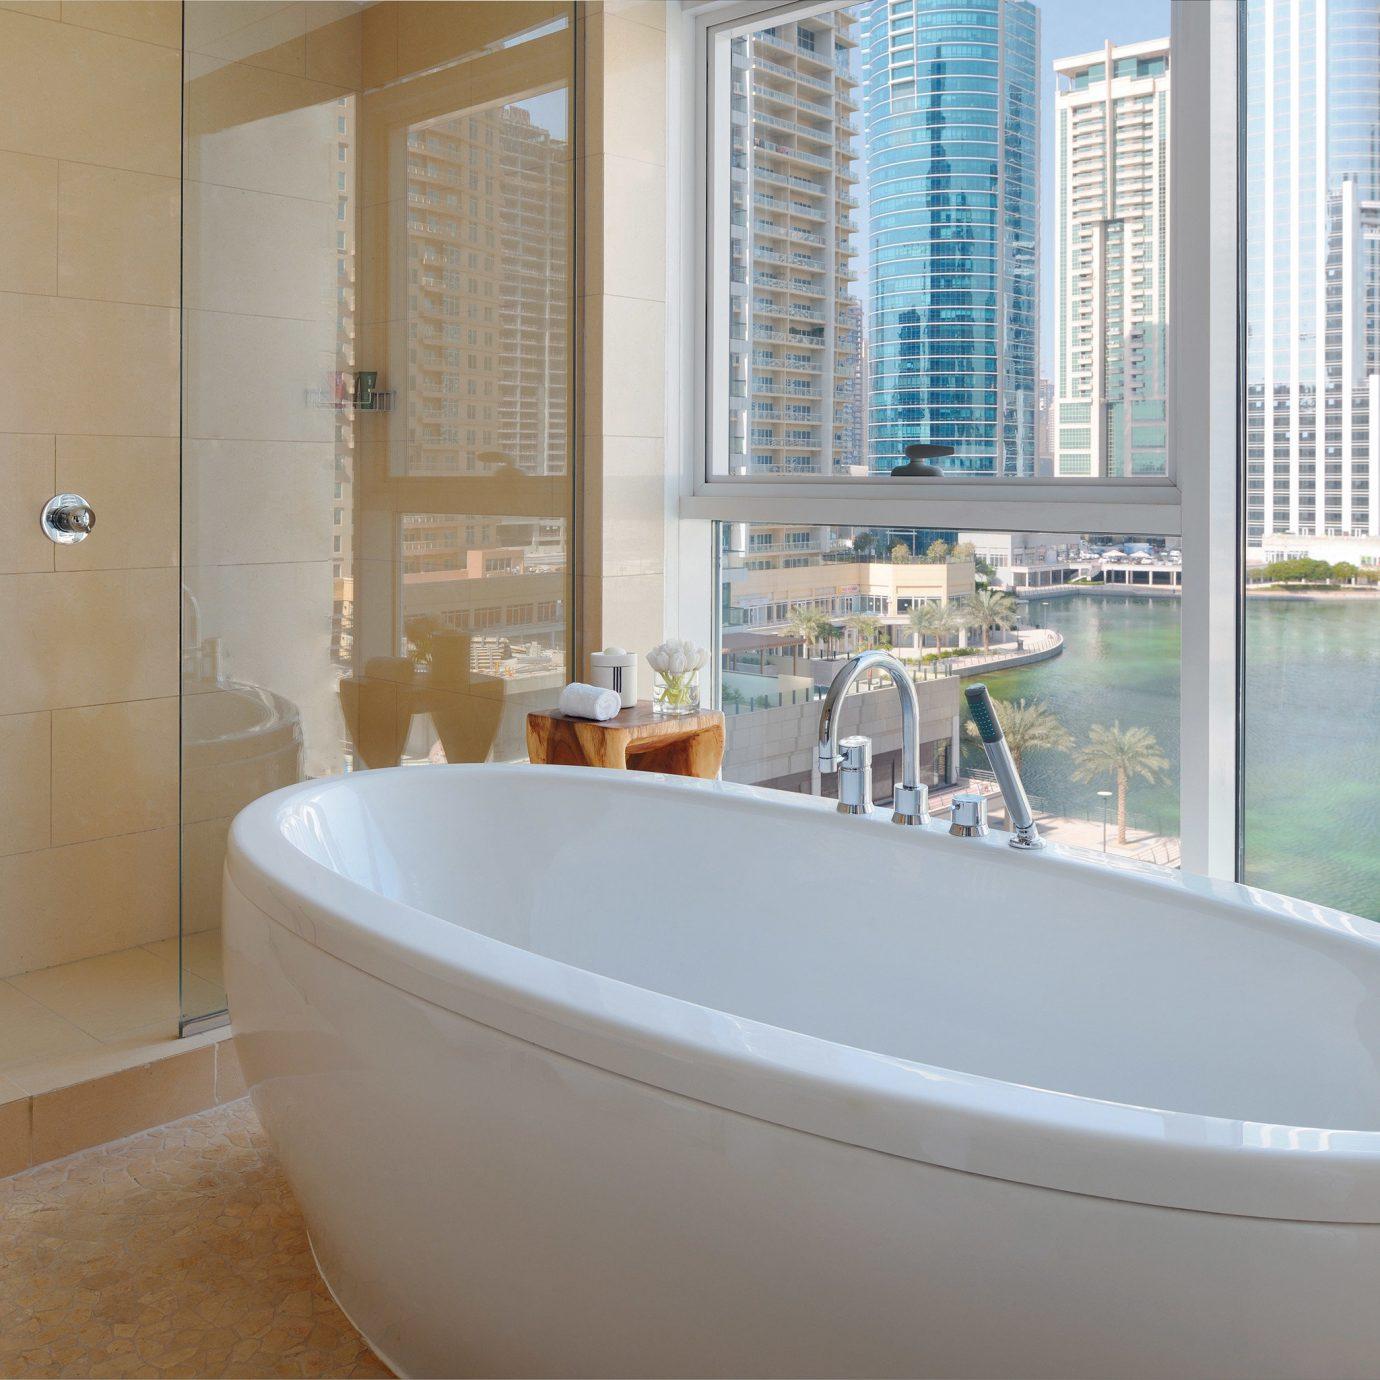 tub swimming pool property bathroom bathtub vessel Bath plumbing fixture bidet jacuzzi